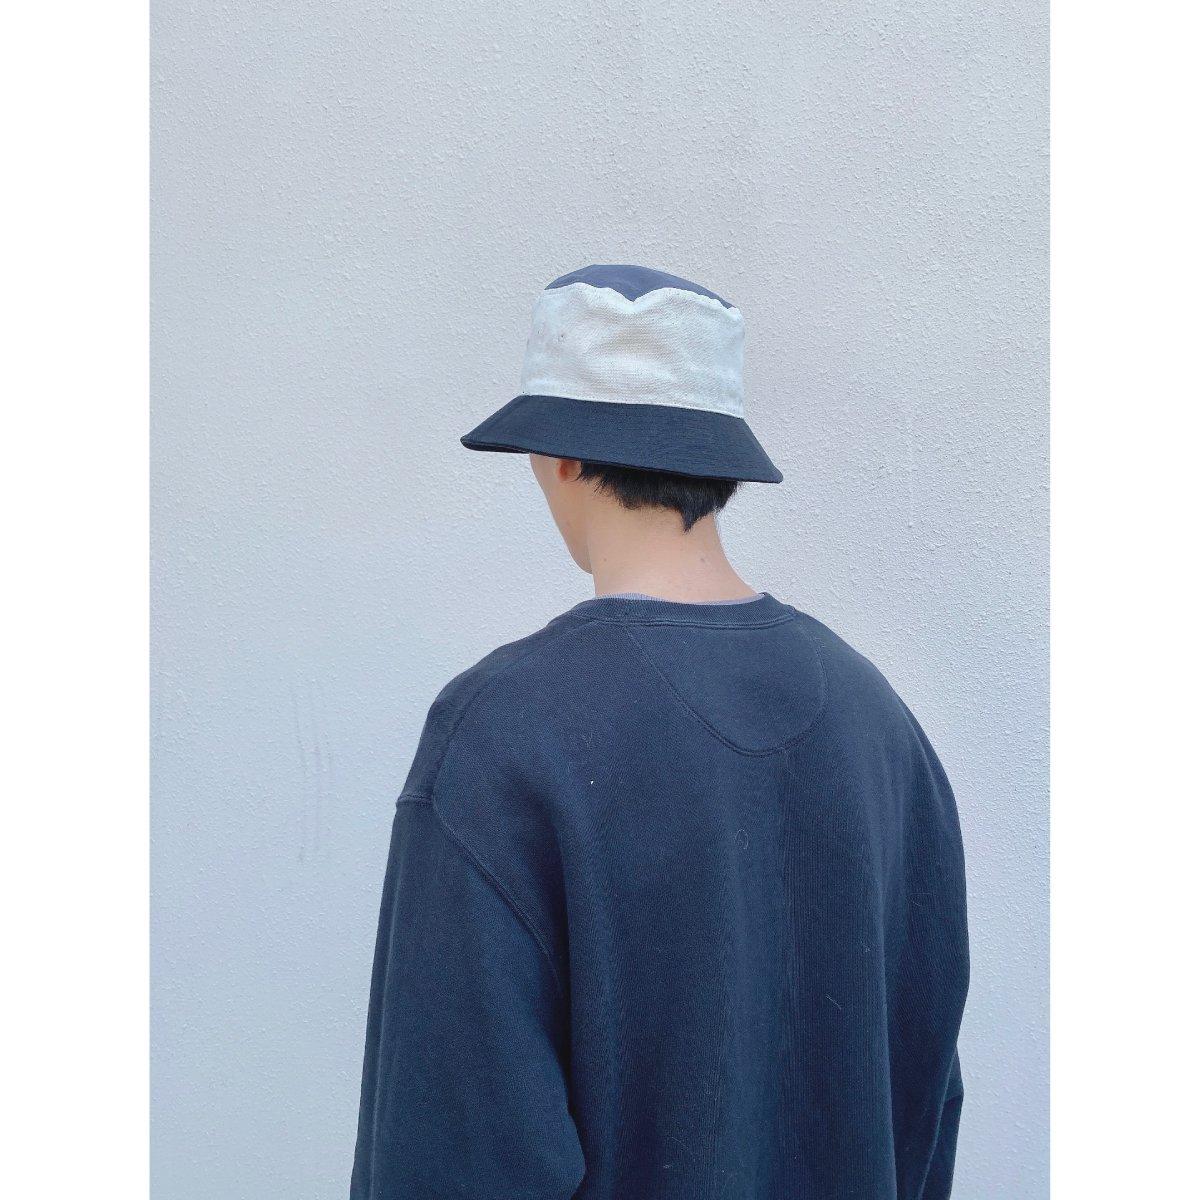 Repro Hat 詳細画像30